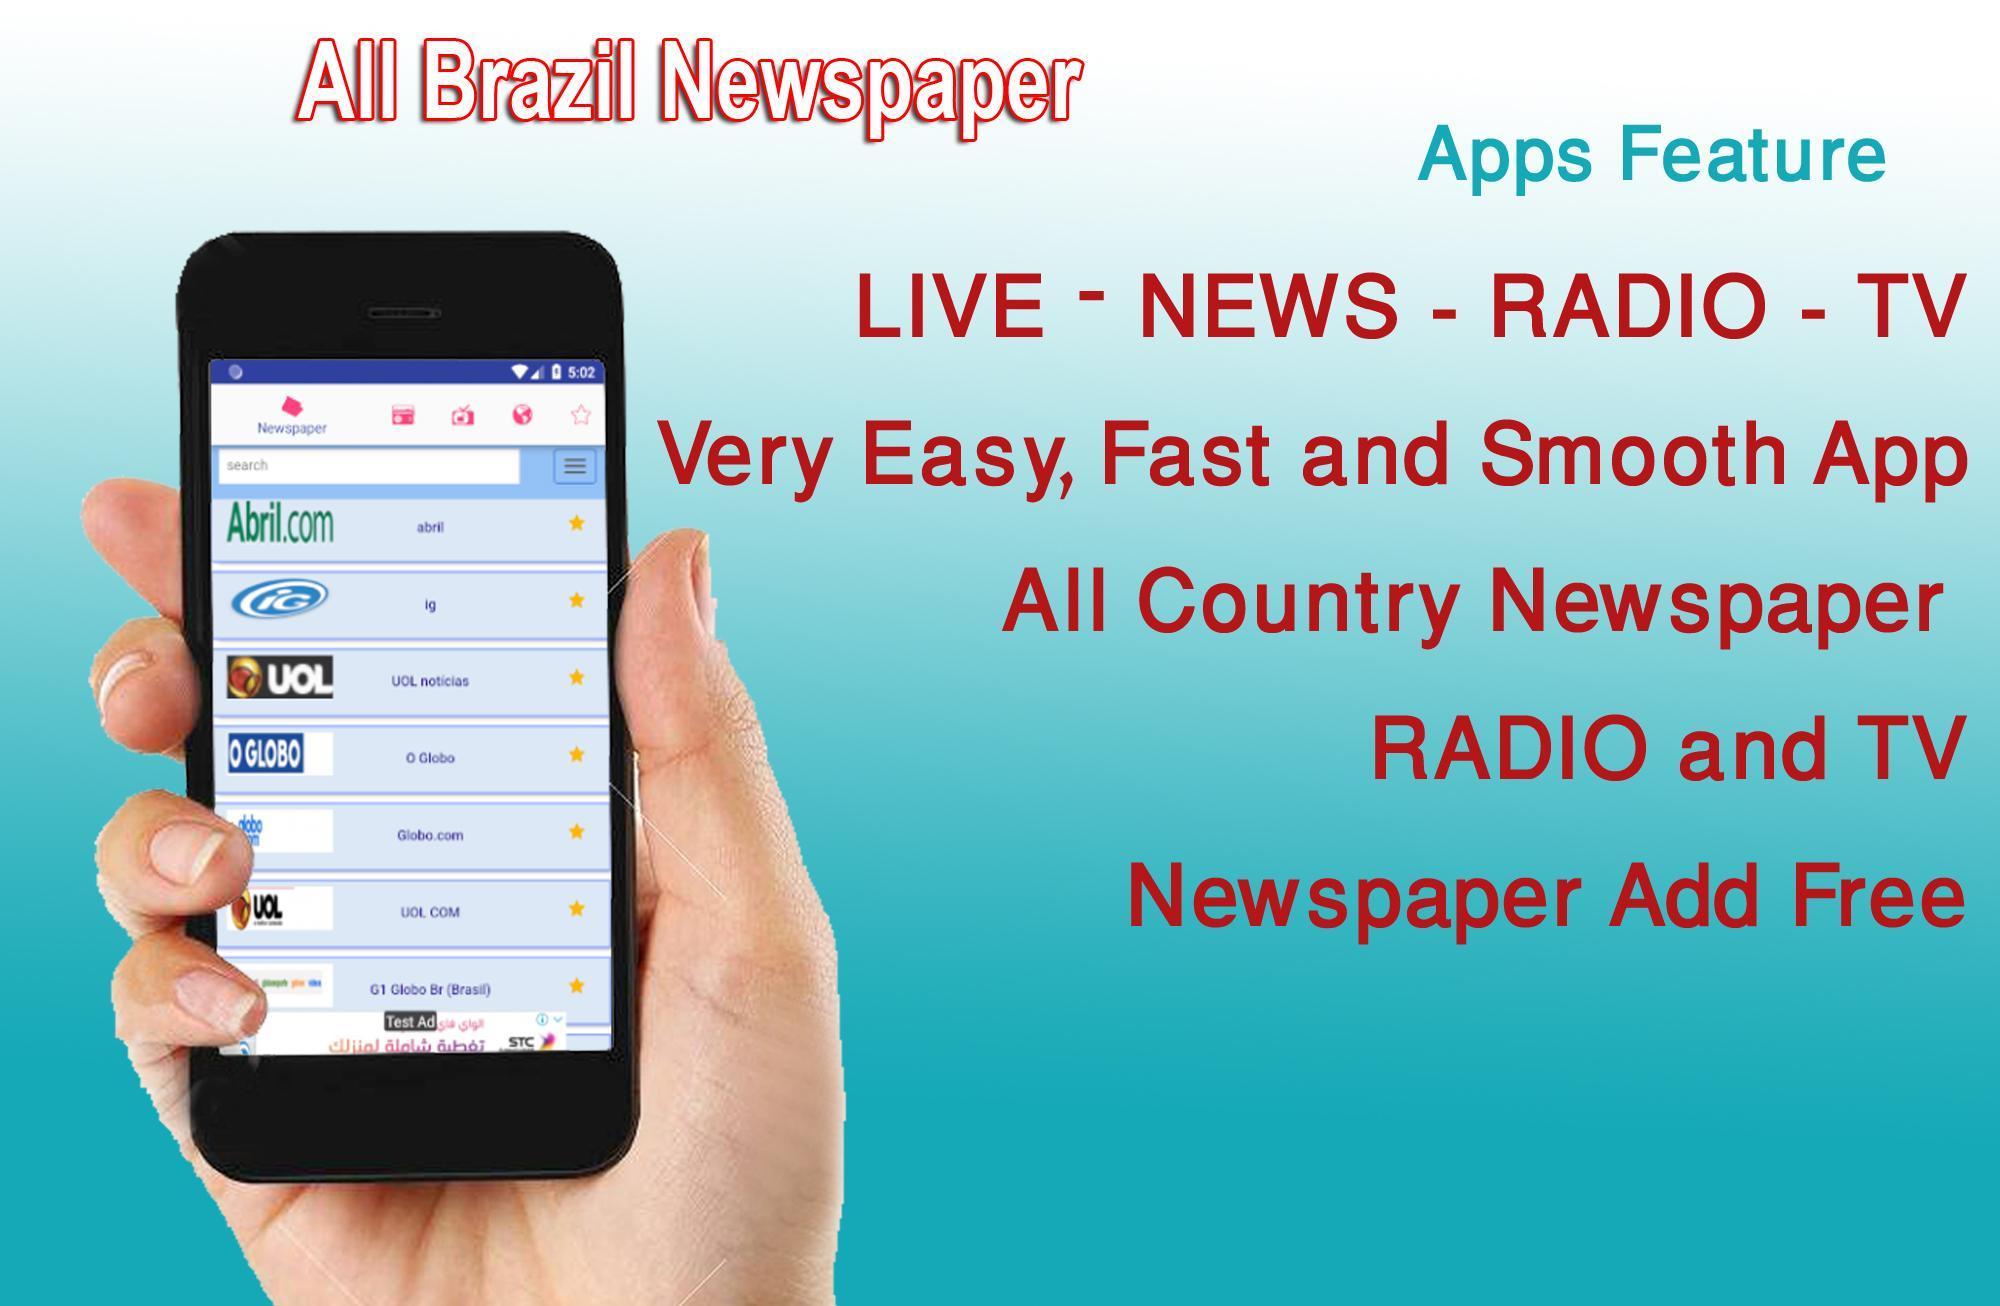 Brazil News - Brasil Notícias - Notícias do Brasil for Android - APK